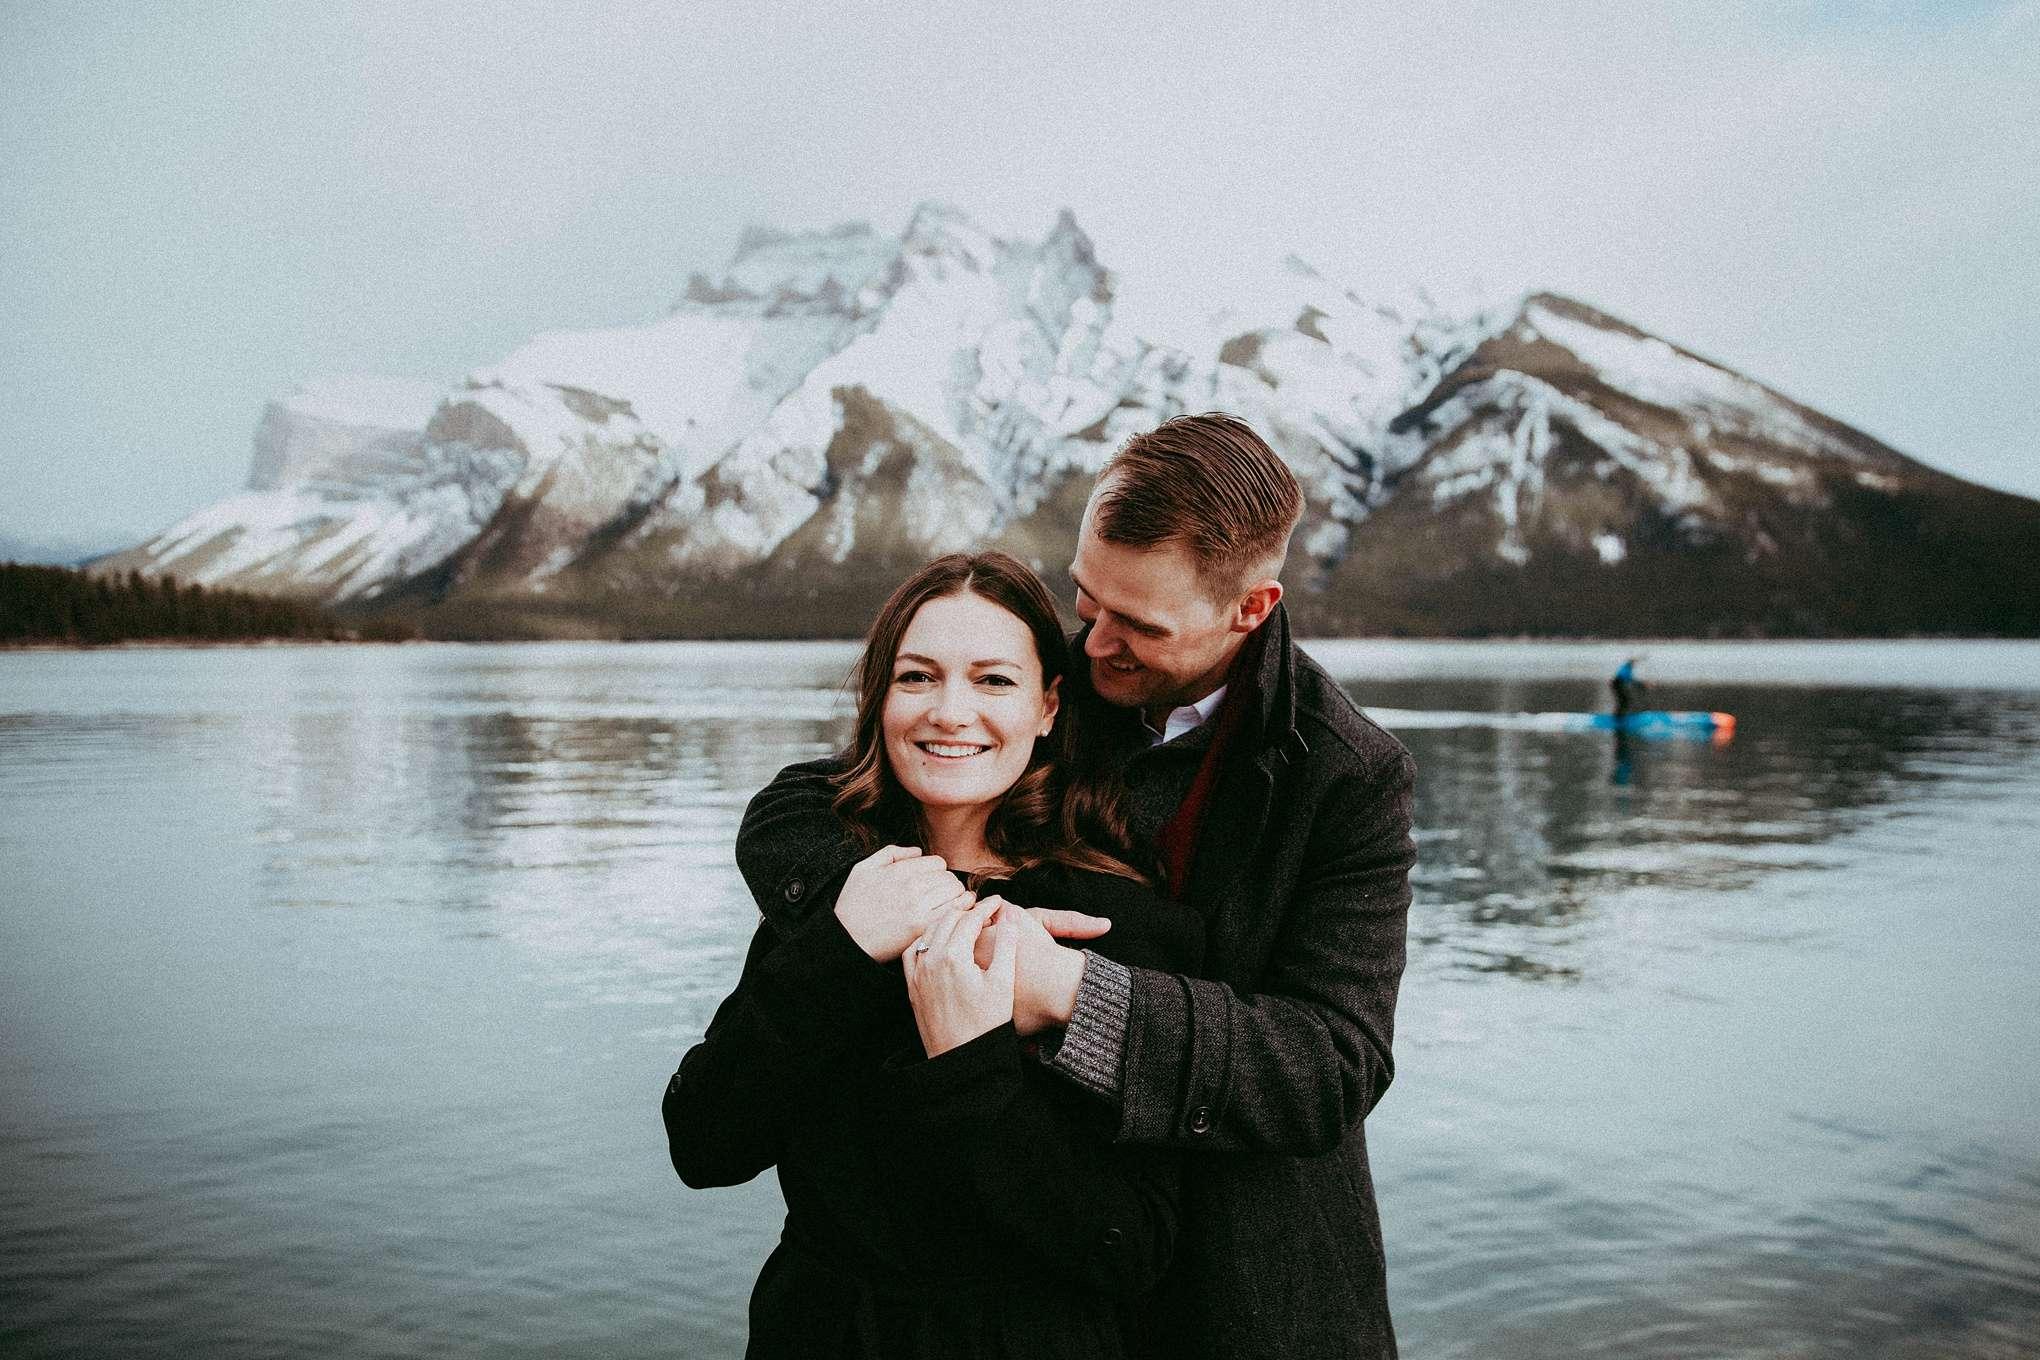 banff engagement session, banff photographers, banff lakes, lake minnewanka, banff alberta, banff national park